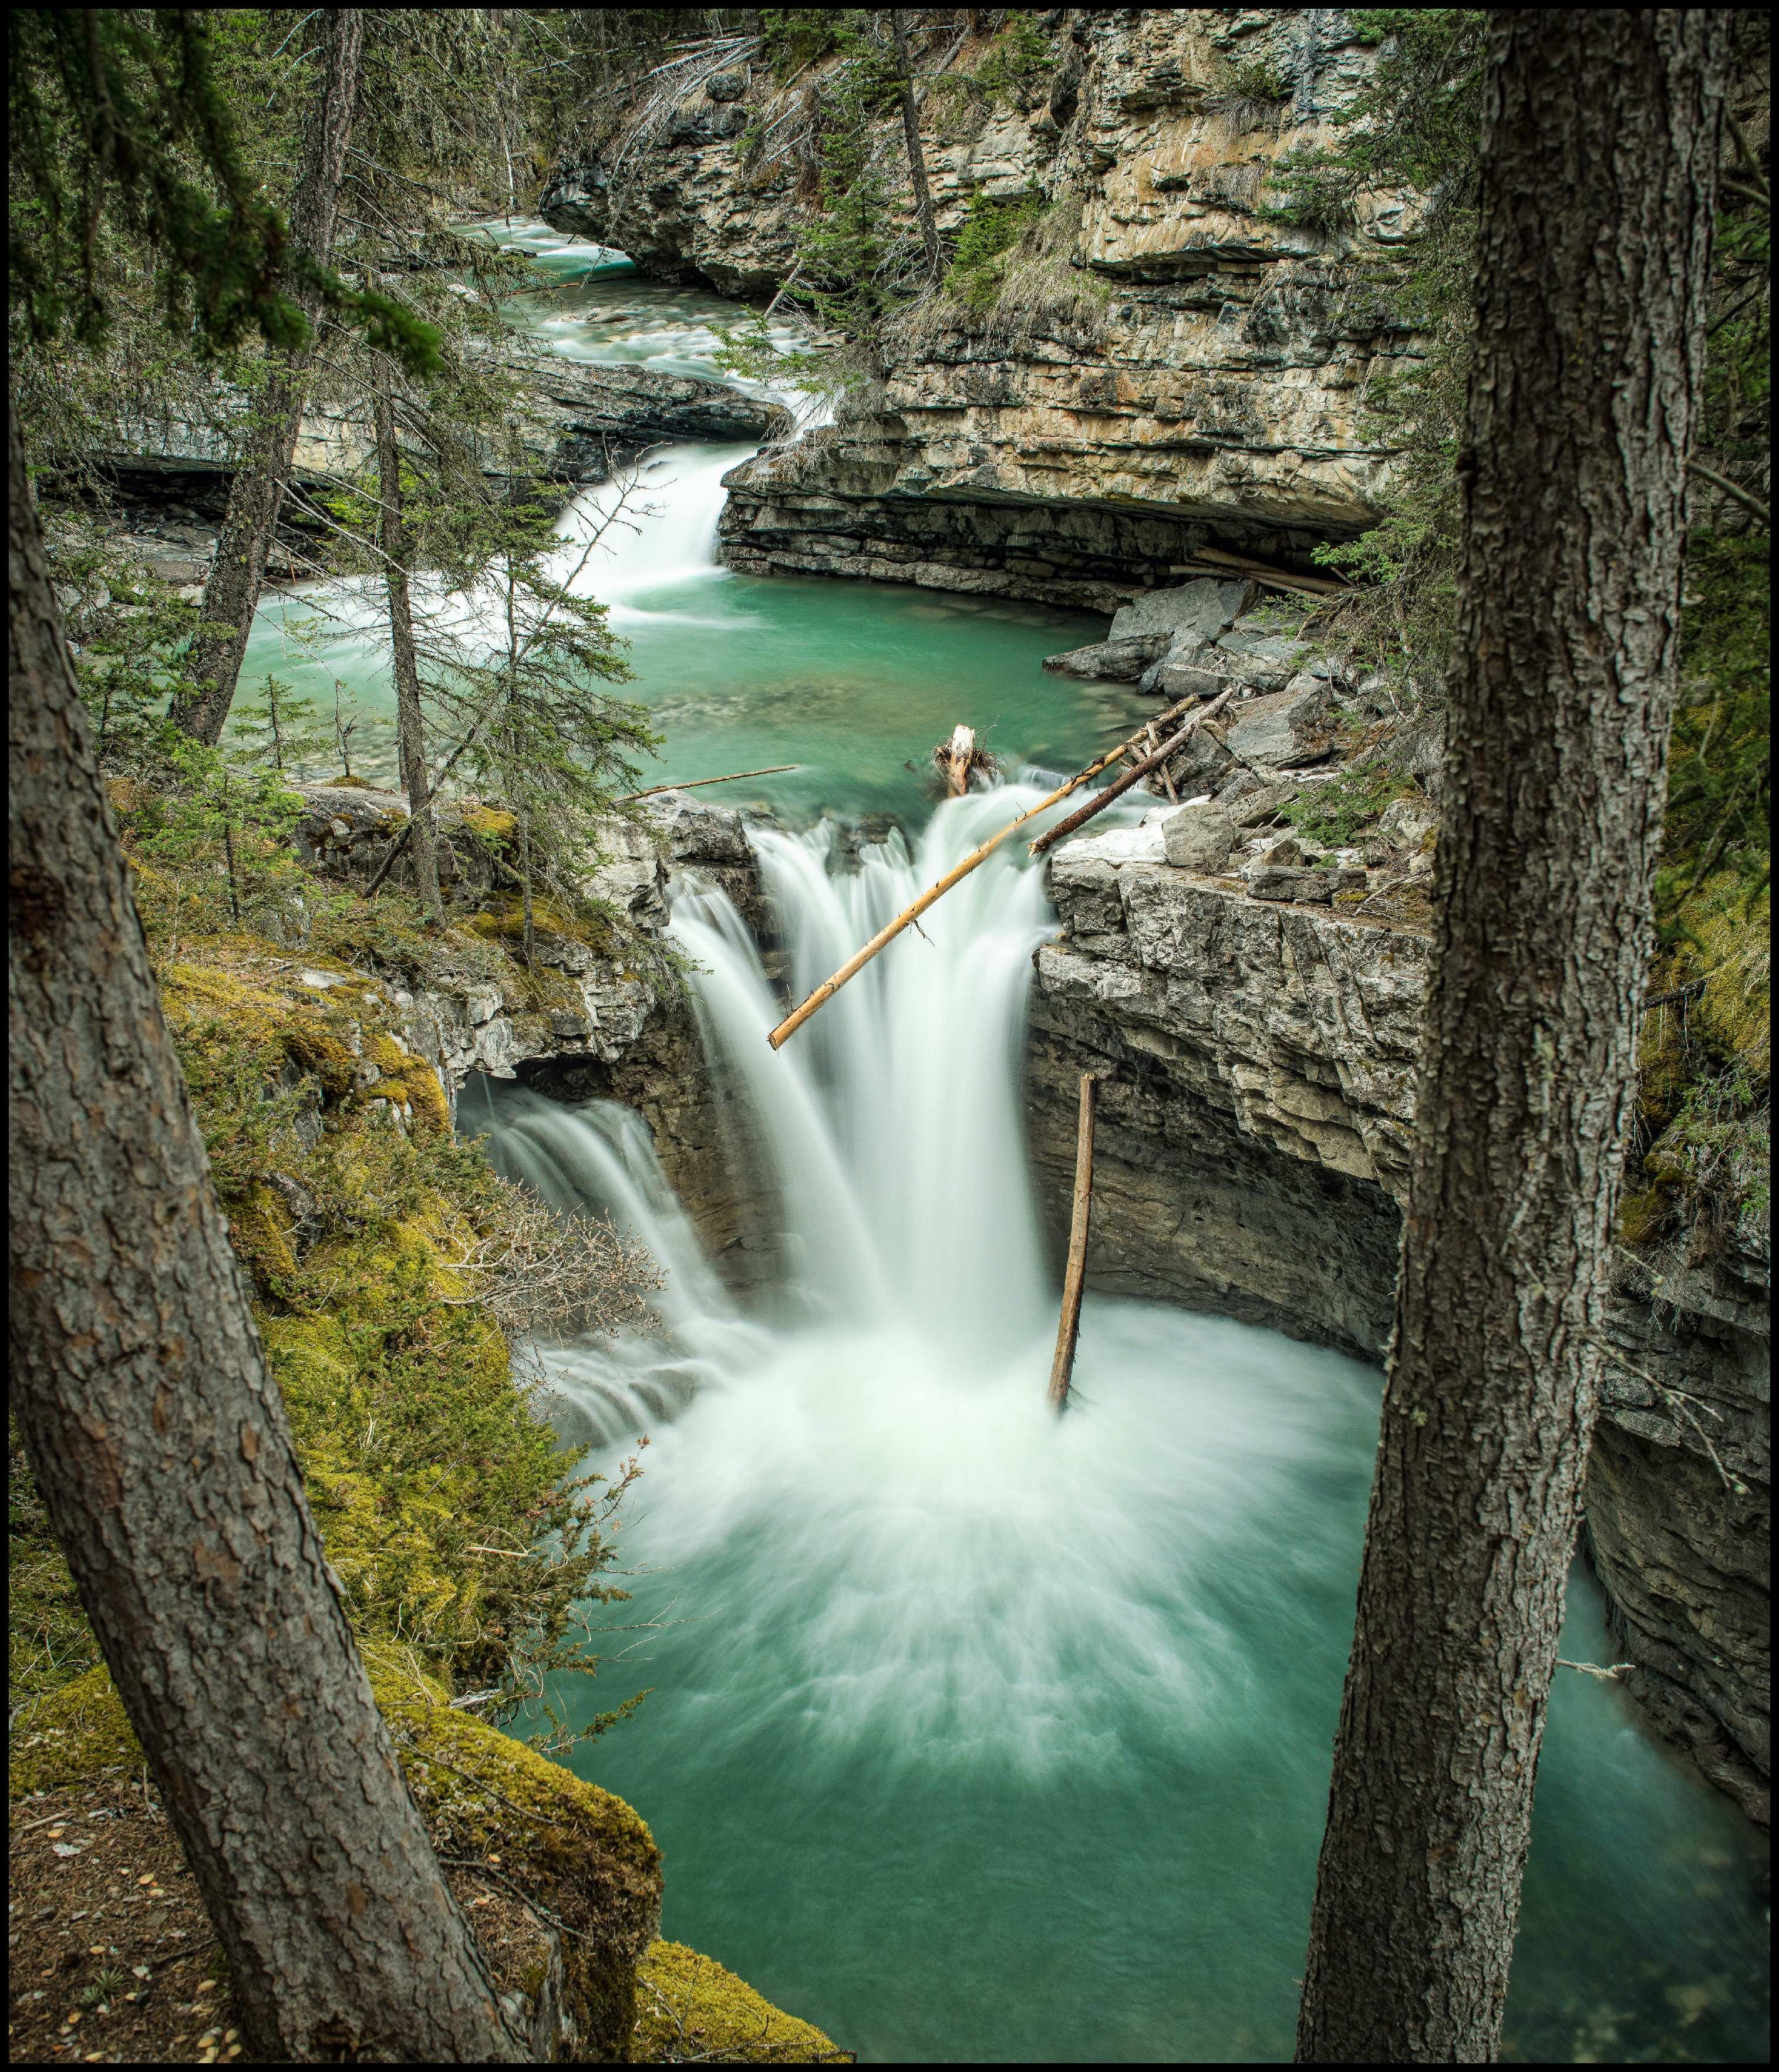 Johnston Canyon Gorge Waterfall Sony A7 / Canon FD Tilt Shift 35 2.8